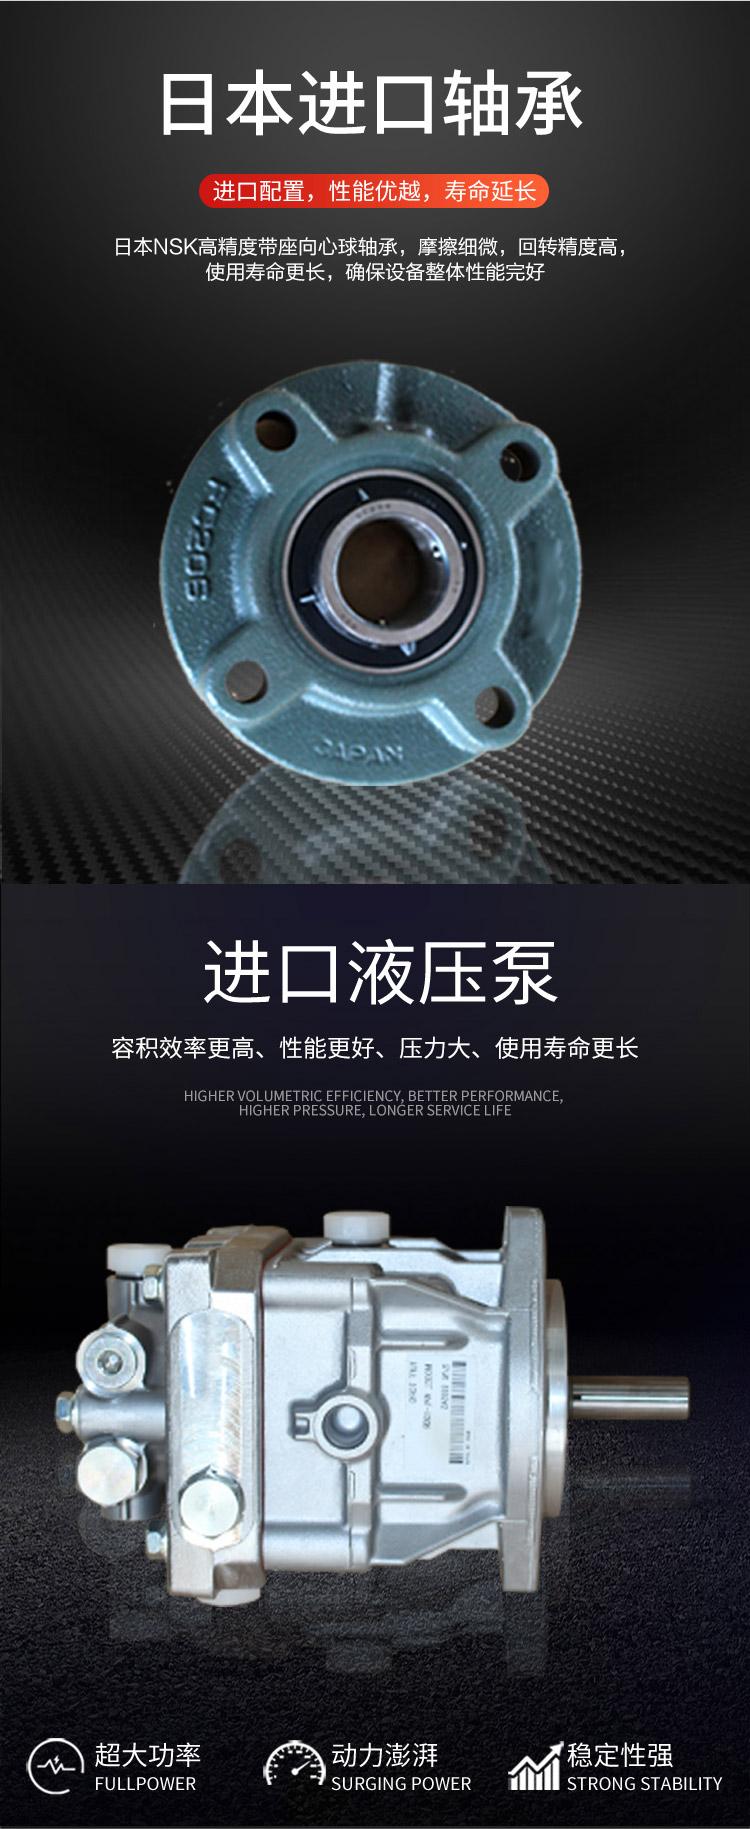 S600C手扶式双钢轮压路机